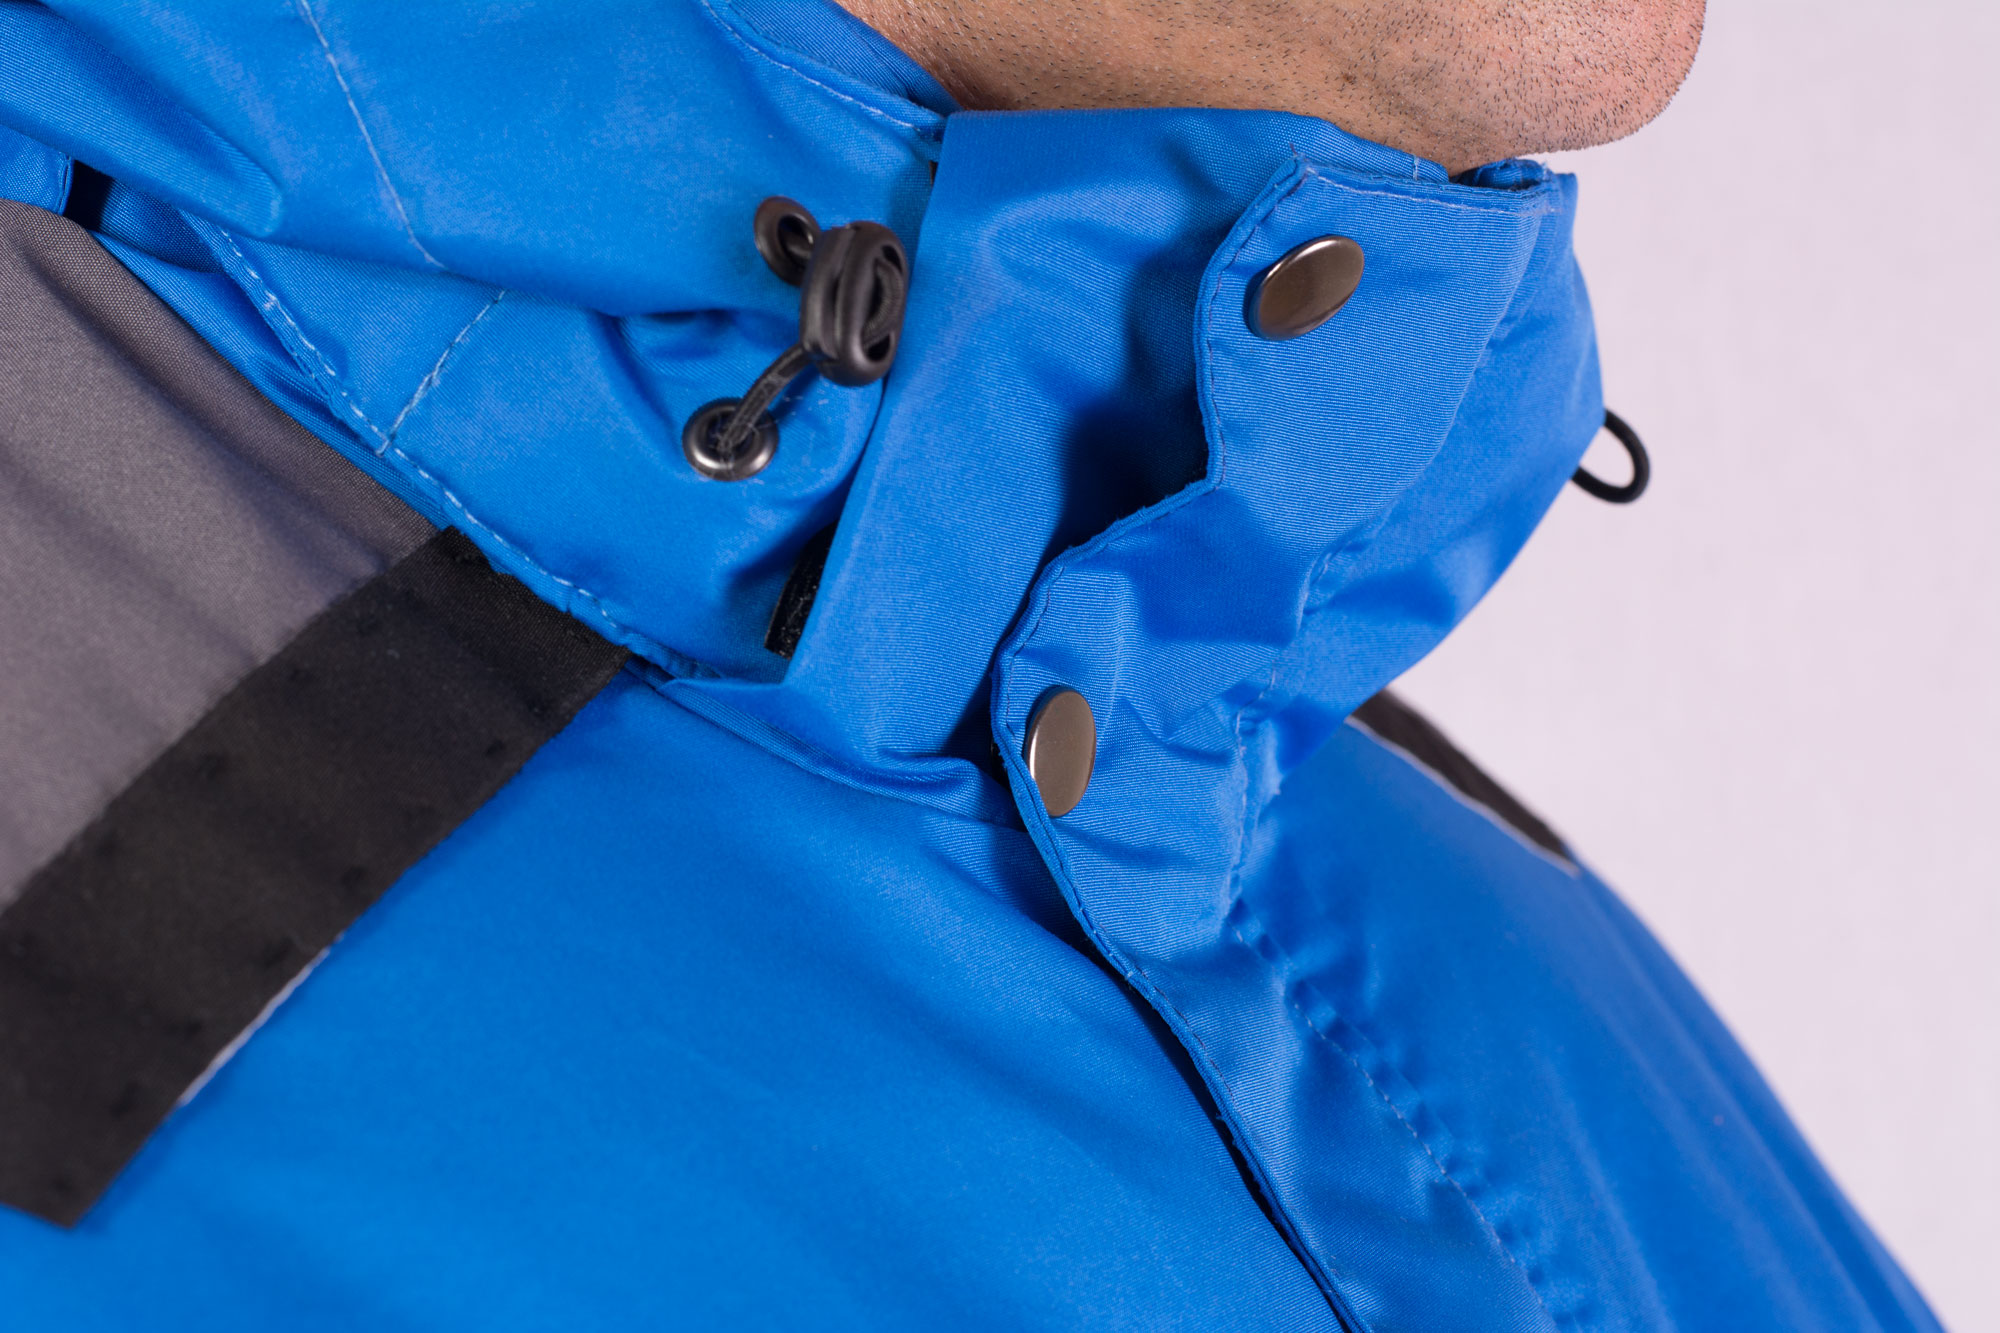 6ddc2368 картинка Горнолыжный костюм Викинг 3 от магазина Спортсоло